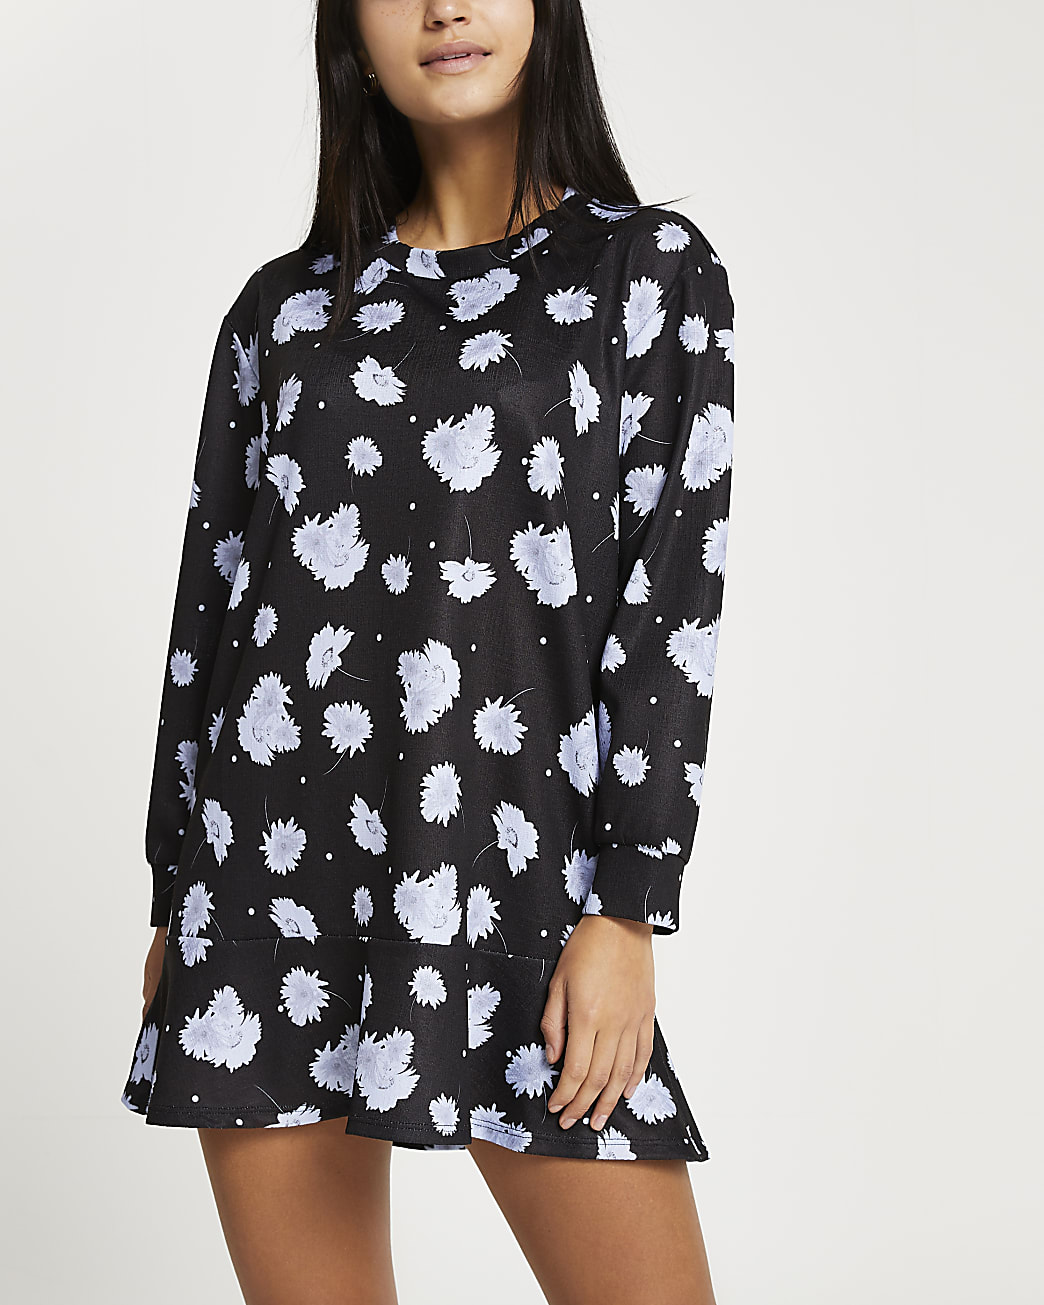 Petite black floral frill hem mini dress